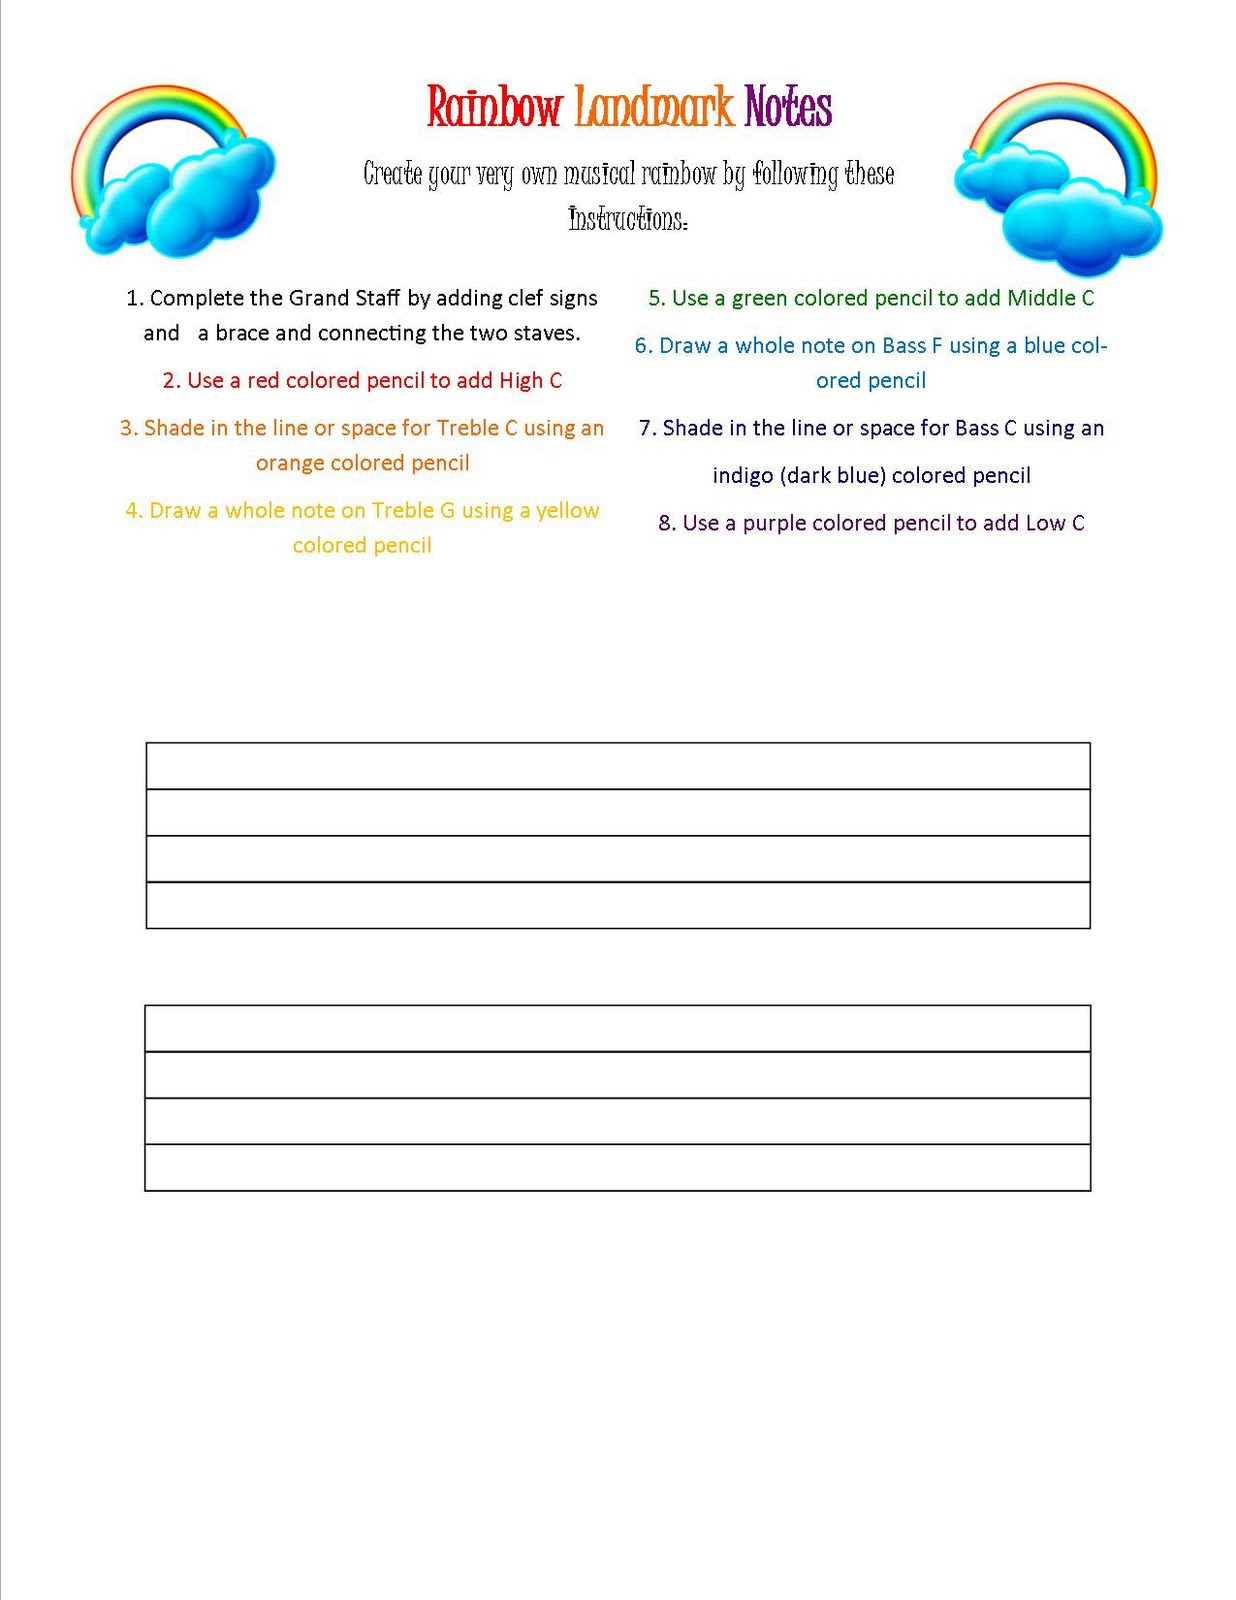 Rainbow Landmark Note Worksheet on Piano Note Reading Worksheets